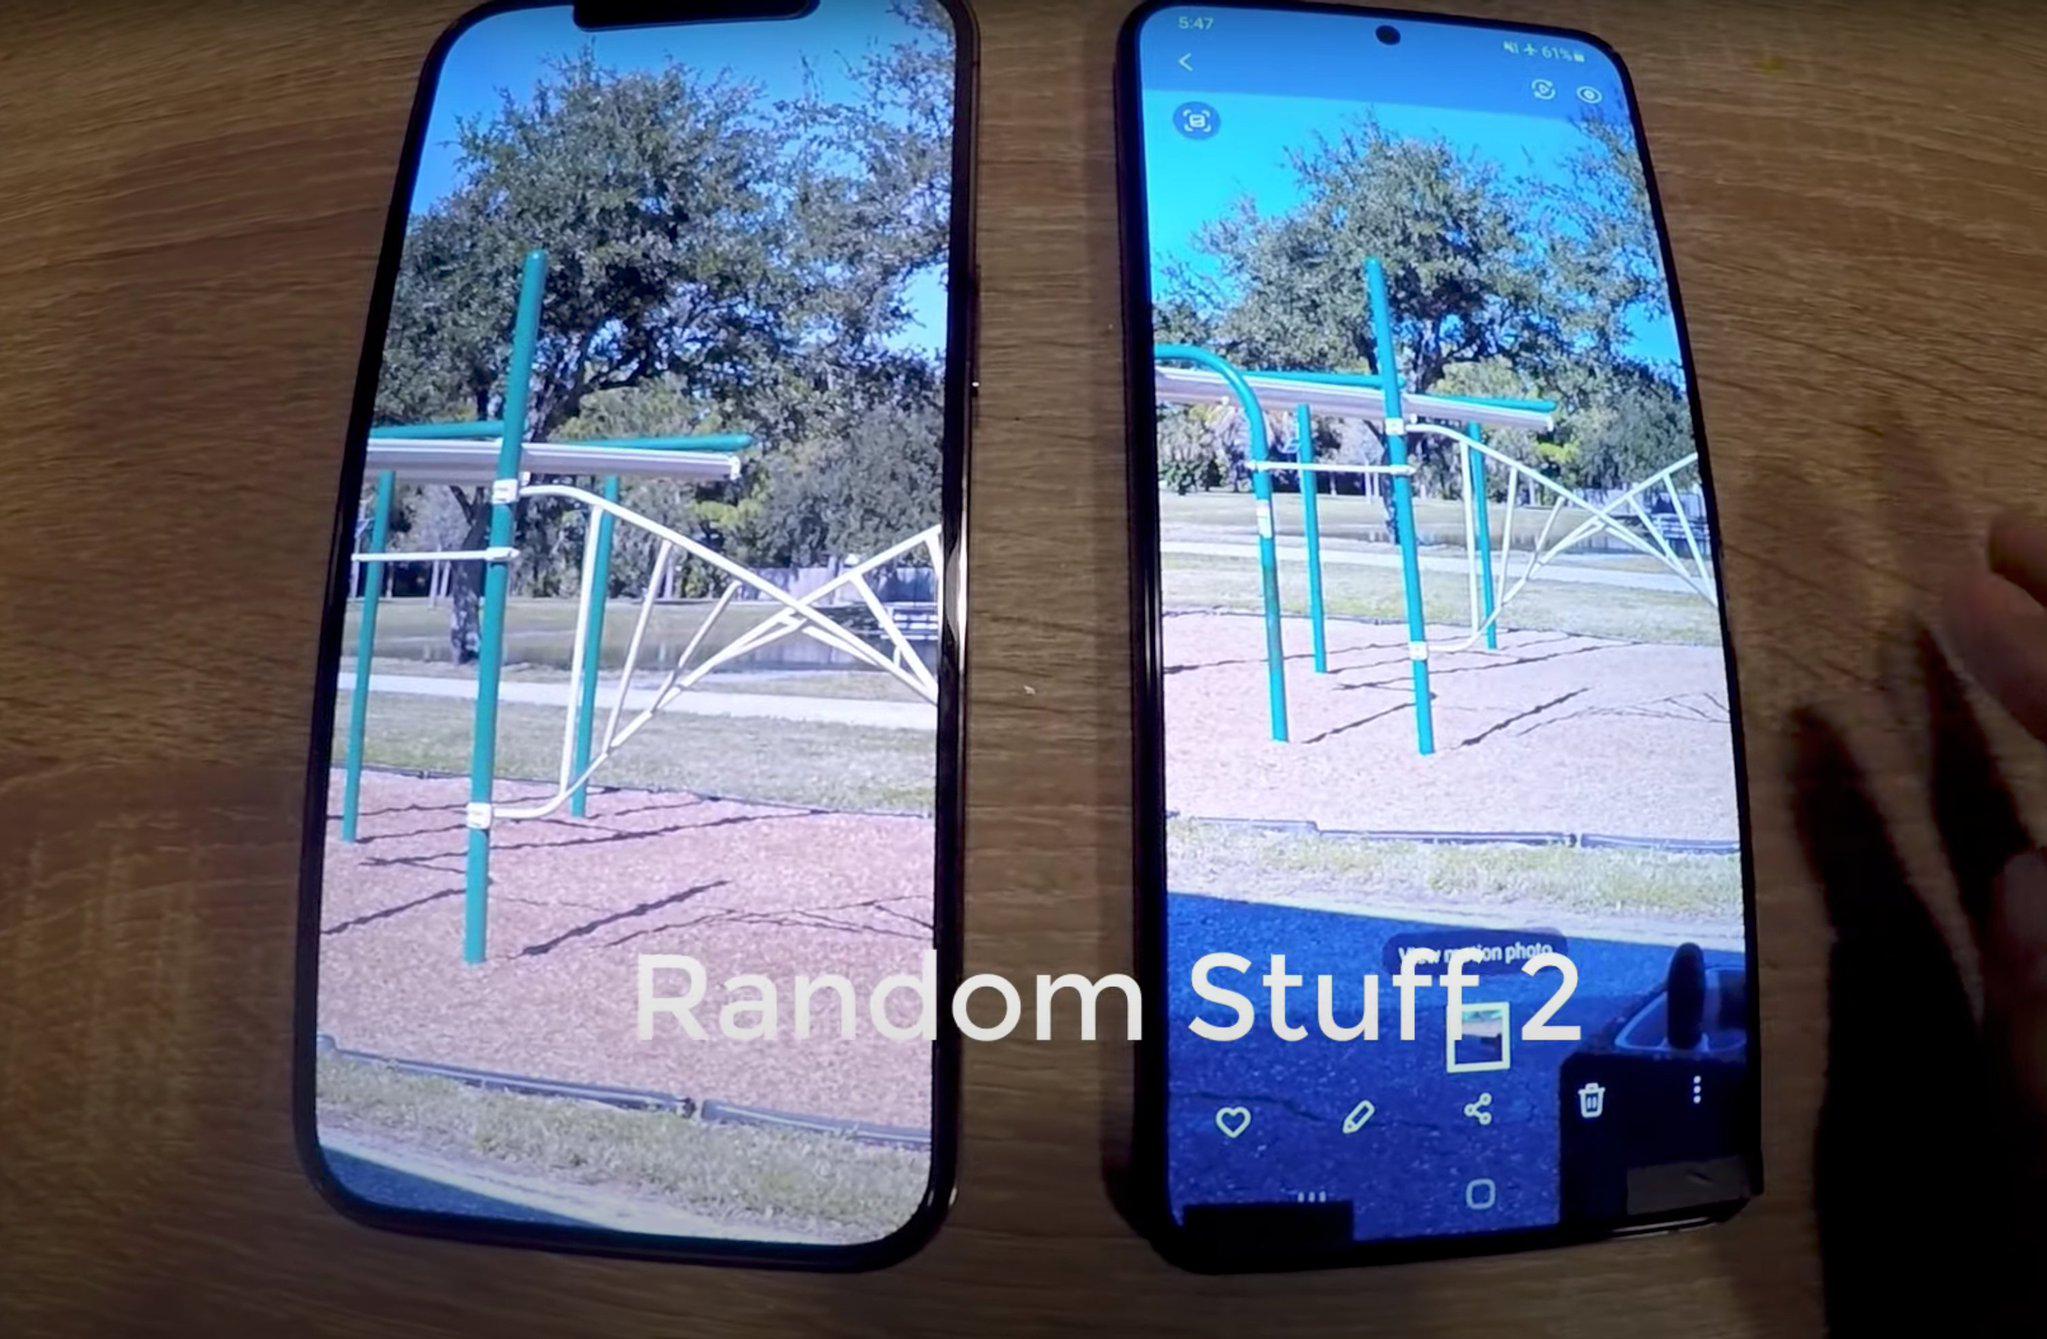 Exclusive Live Renders of Samsung Galaxy S21 series phones